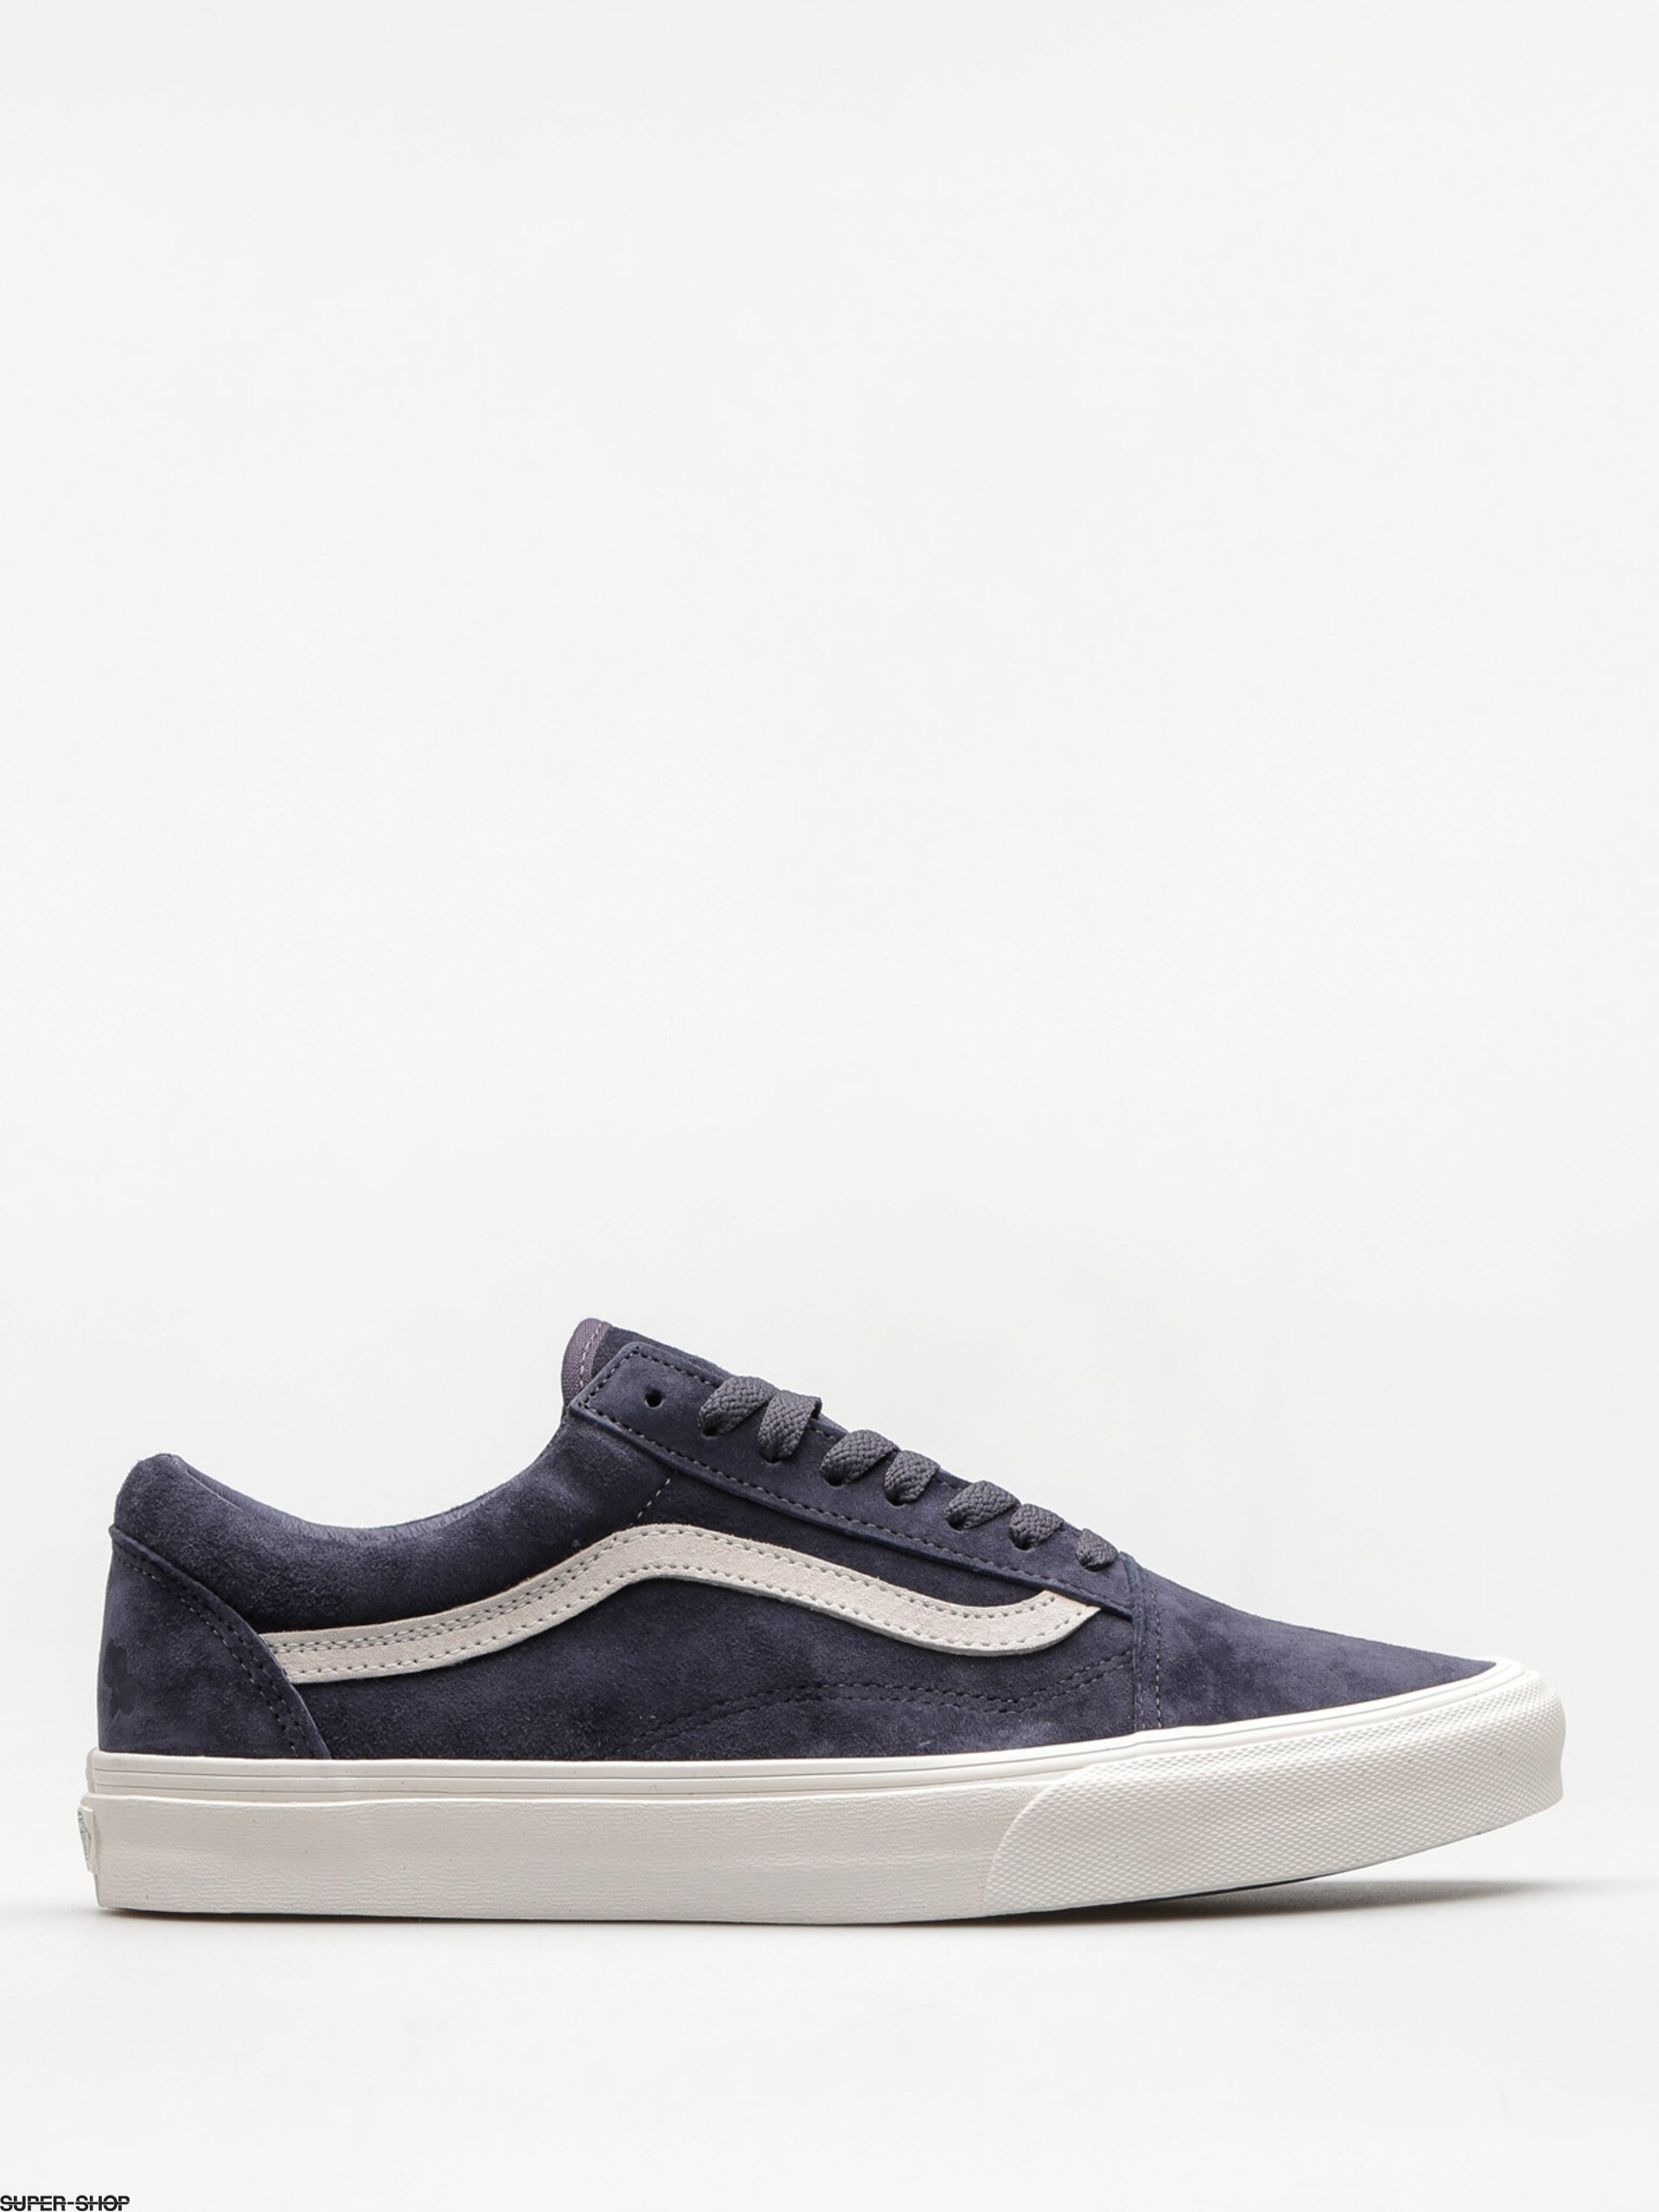 0f2ccb36173952 Vans Shoes Old Skool (pig suede parisian night blanc de blanc)